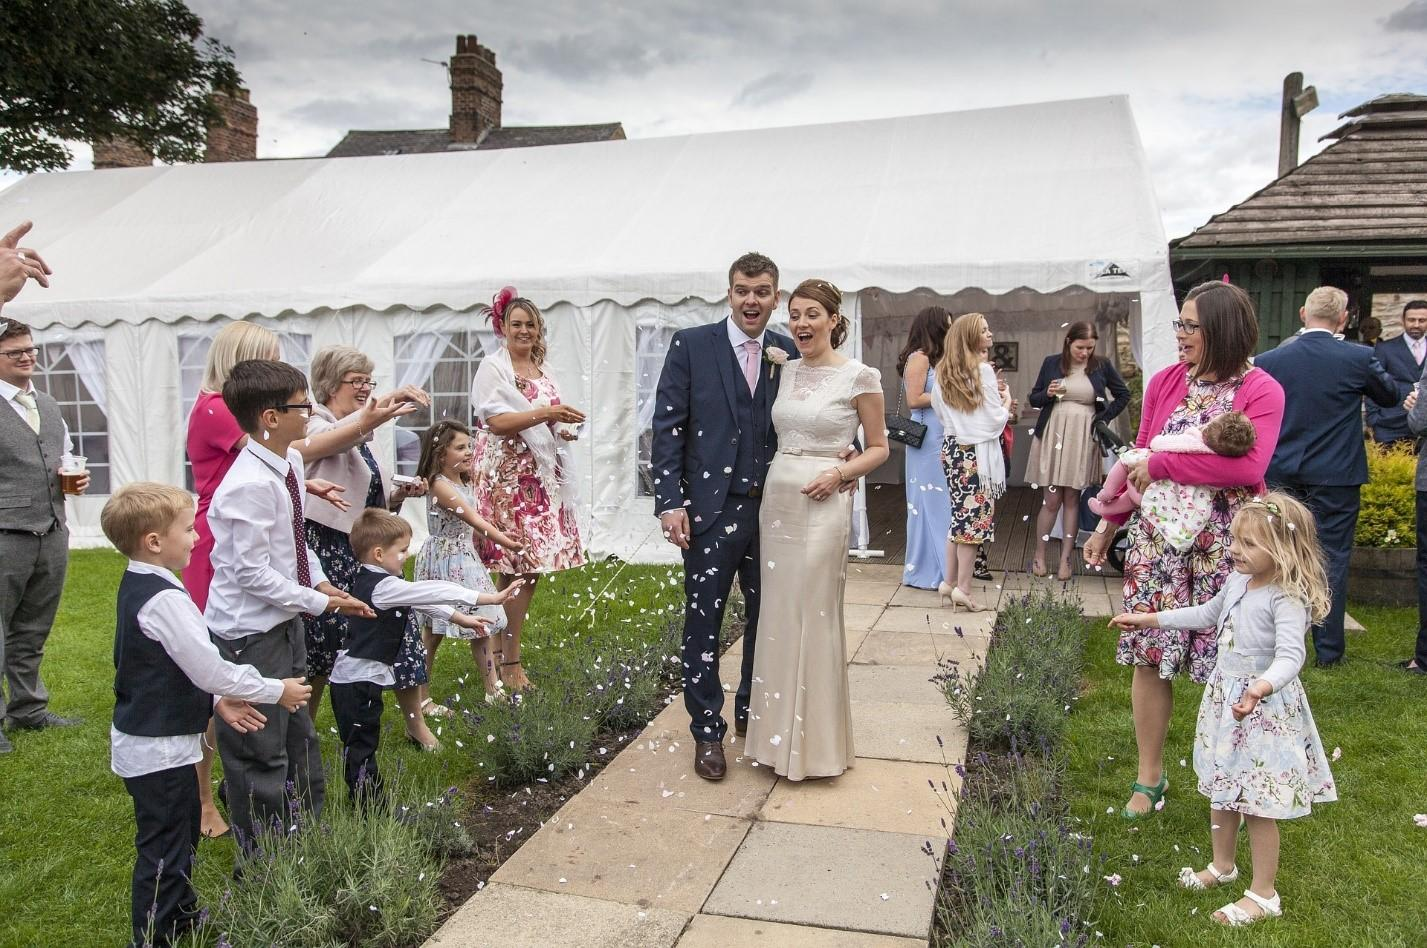 дети на свадьбе 2